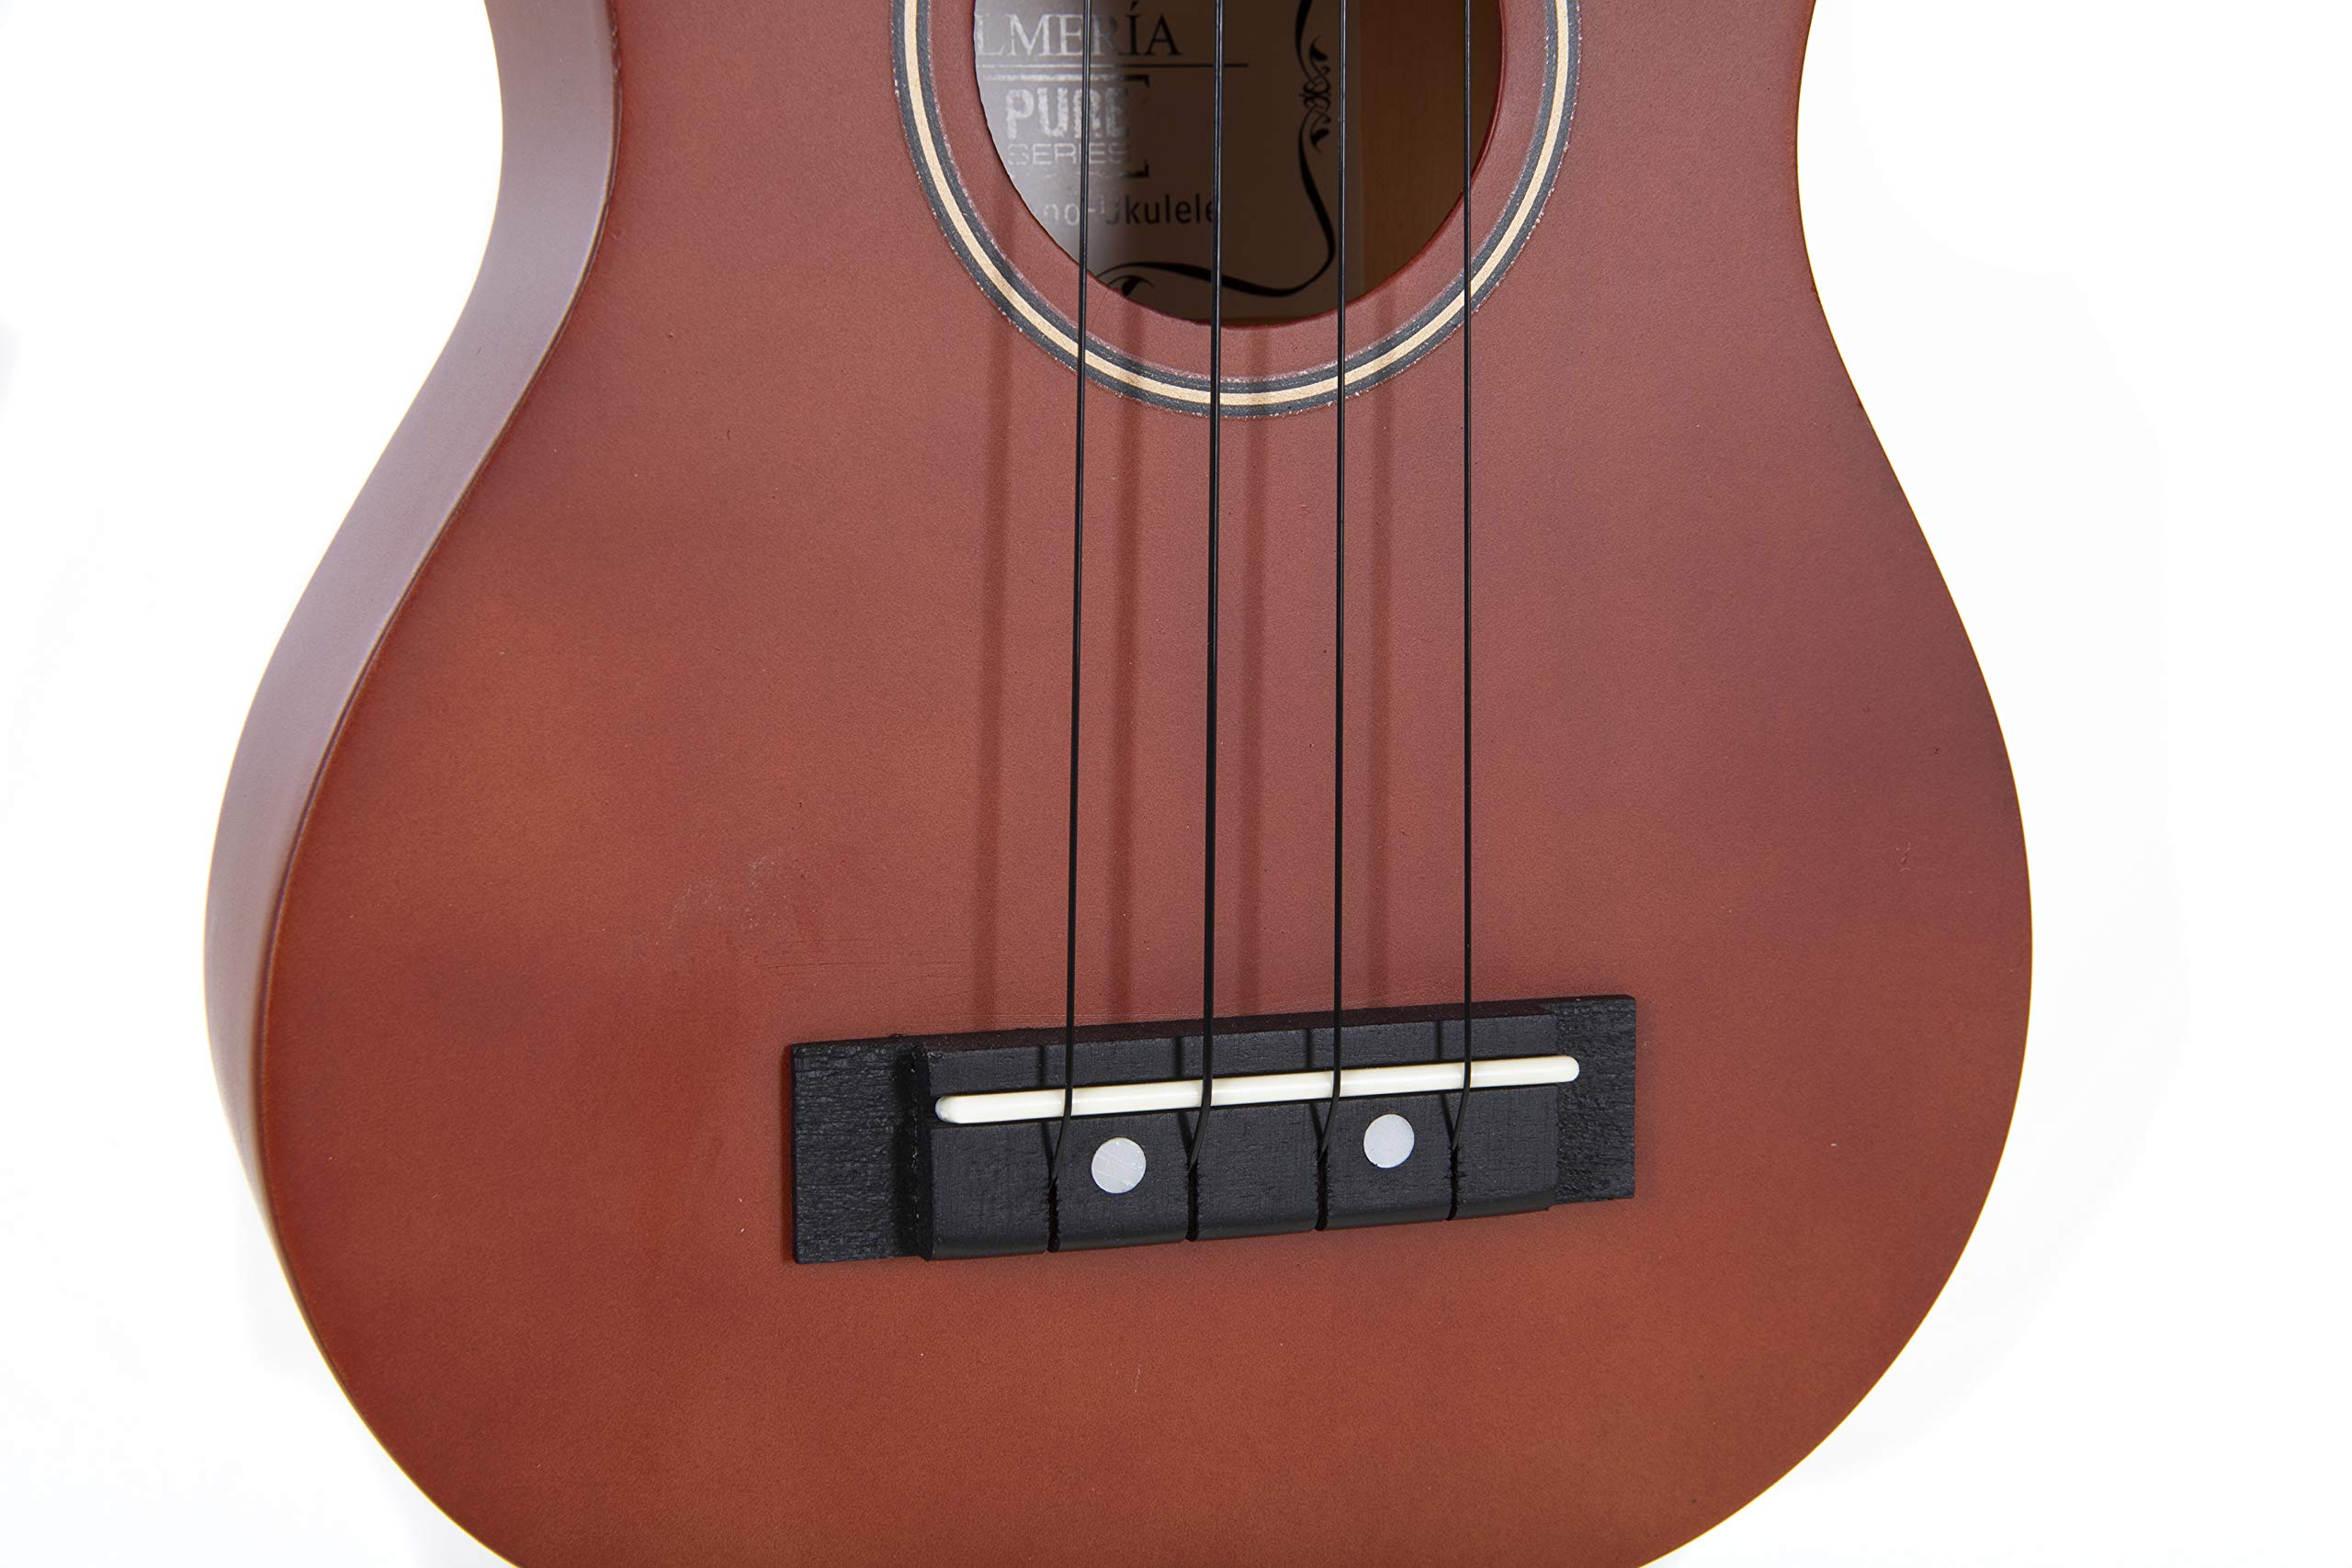 GEWApure PS502820 Ukelele soprano Almeria Player Pack - color ...